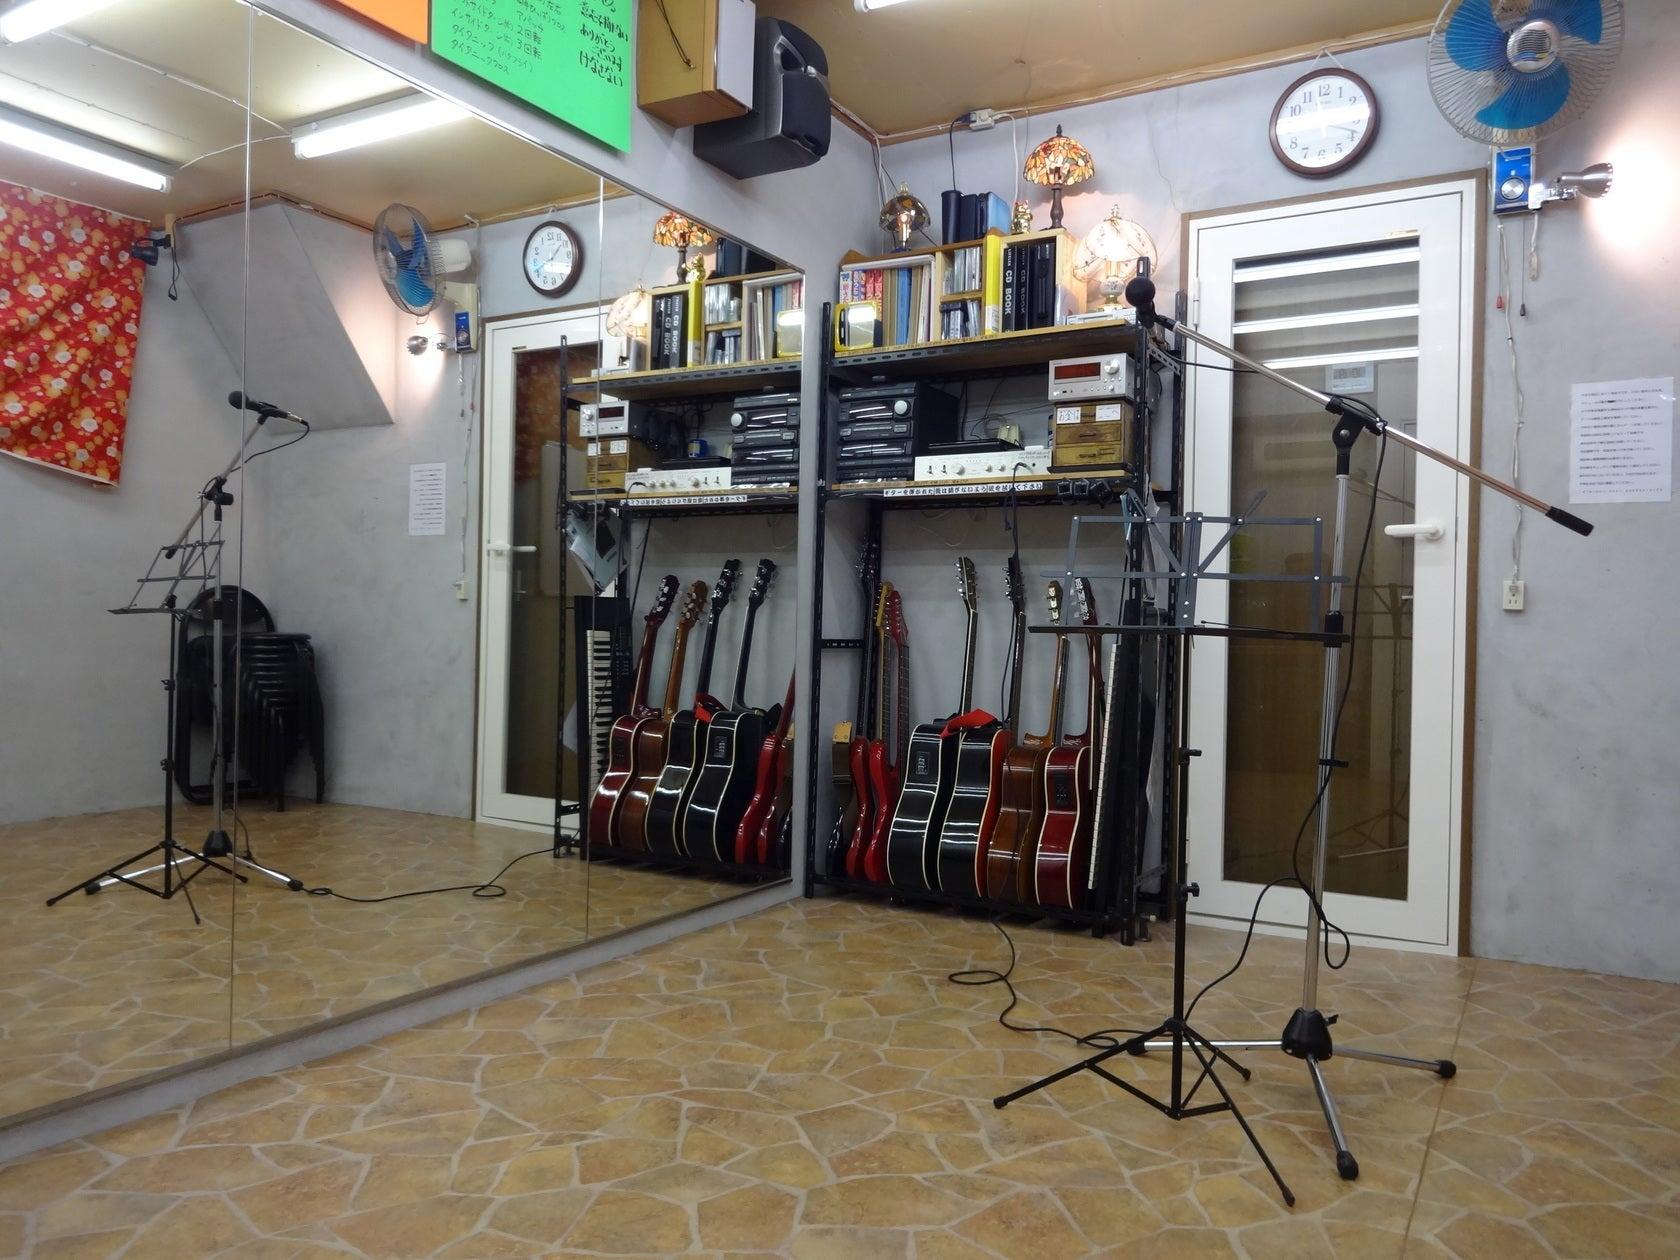 Johnny貸しスタジオ【京都・くいな橋駅徒歩7分】大きな鏡のある防音個室貸しスタジオ!楽器貸出無料!(Johnny貸しスタジオ) の写真0